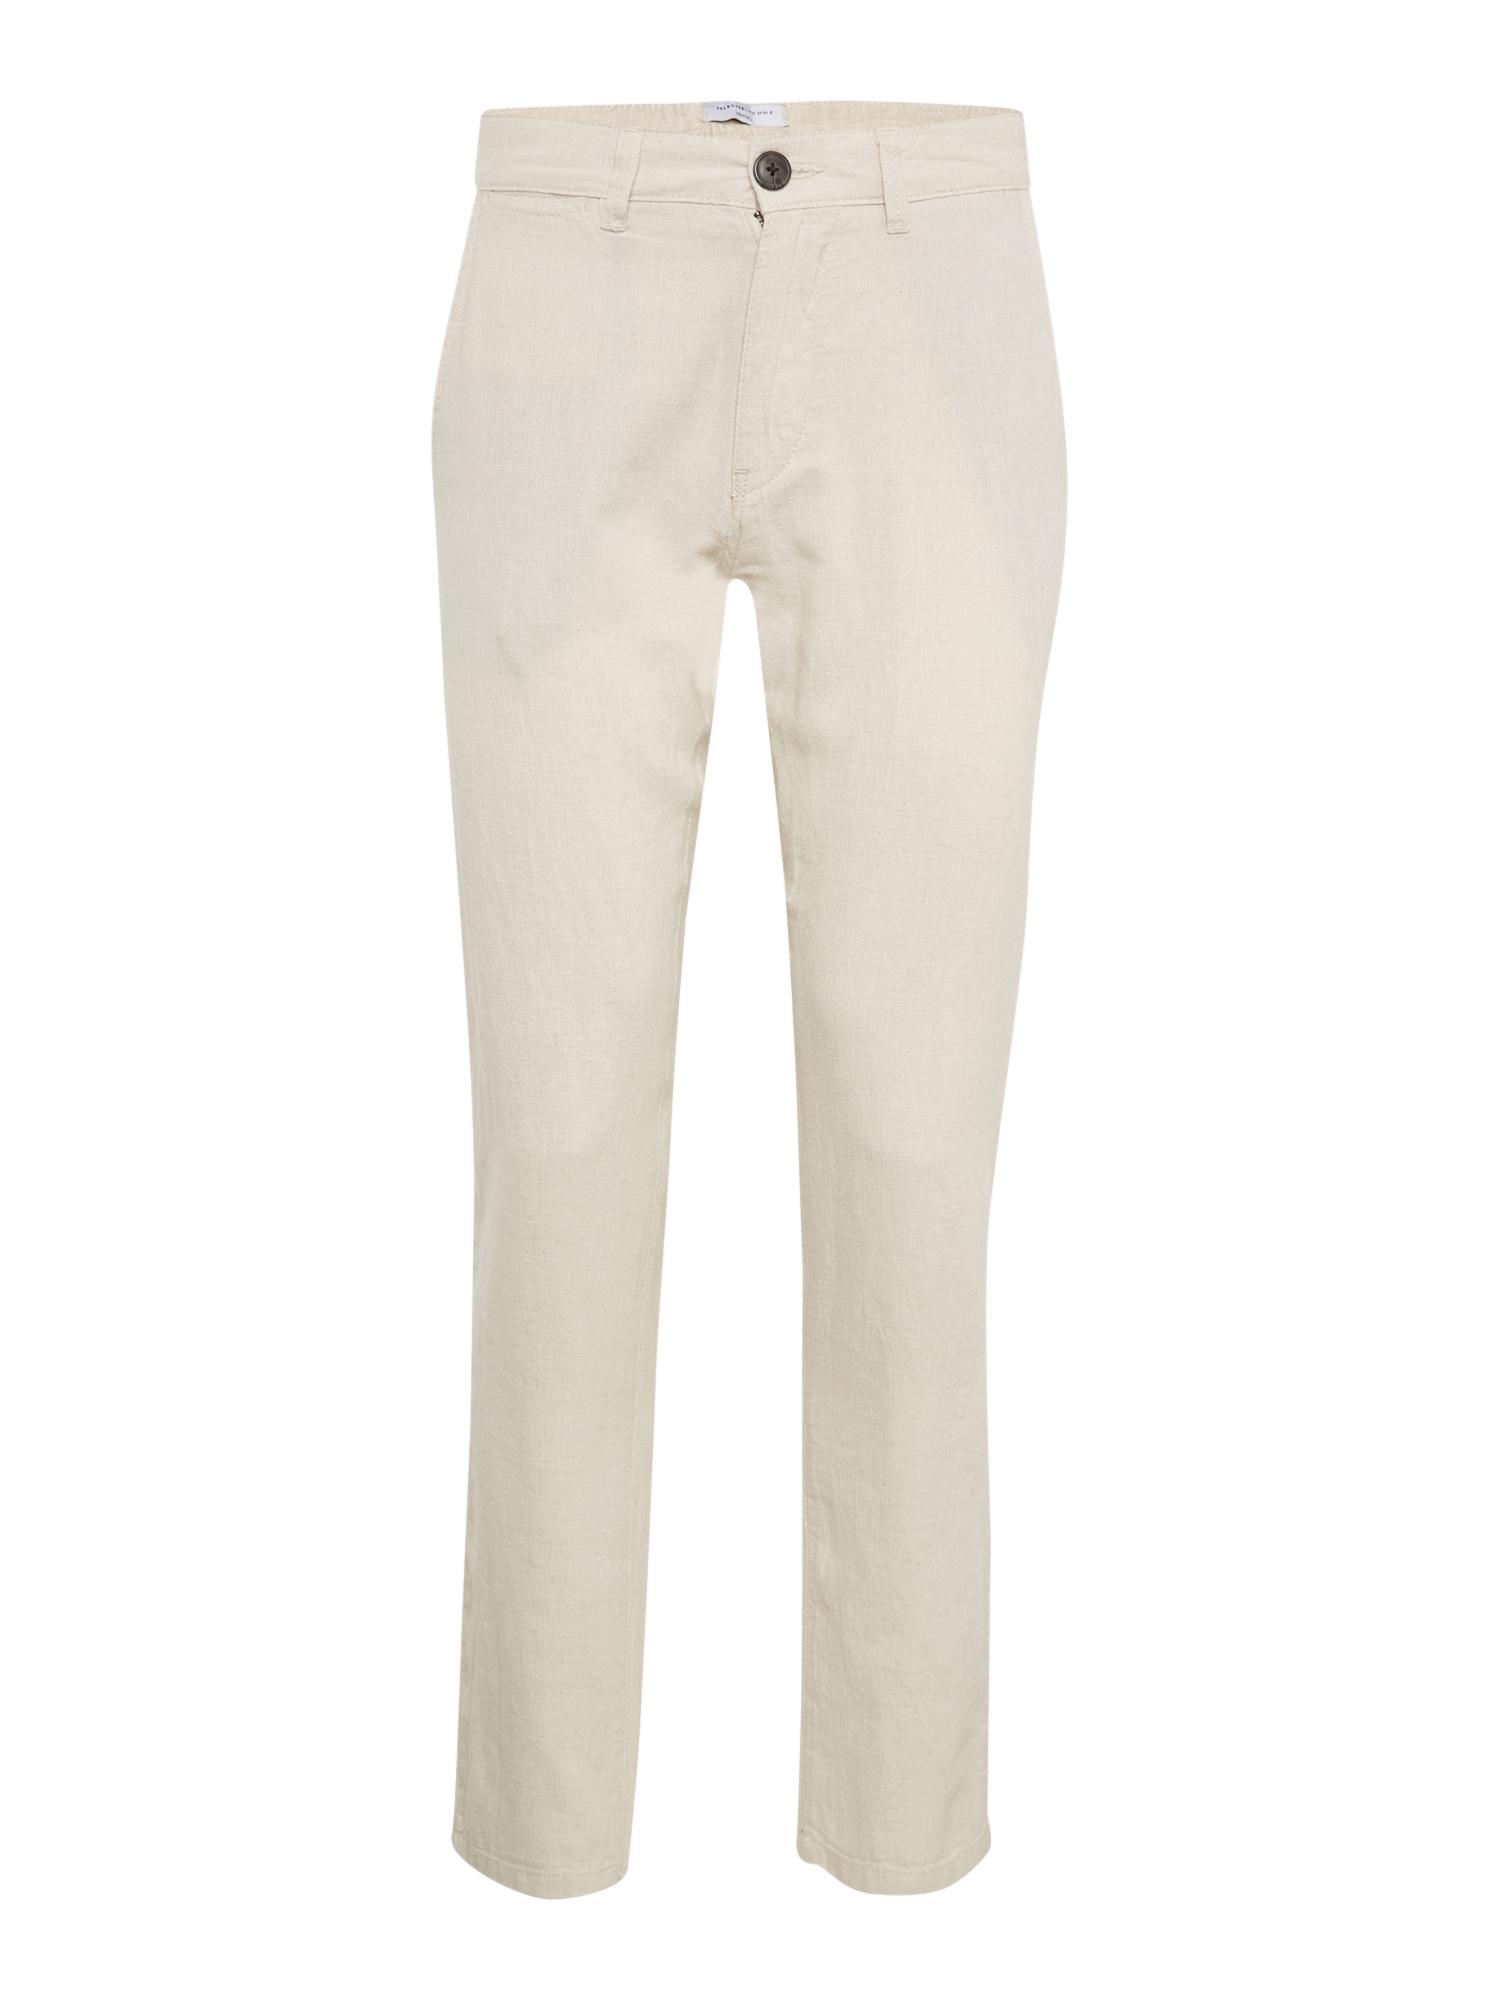 Chino kalhoty SHDJAMES OYSTER GREY LINEN TAPERED PANTS béžová SELECTED HOMME